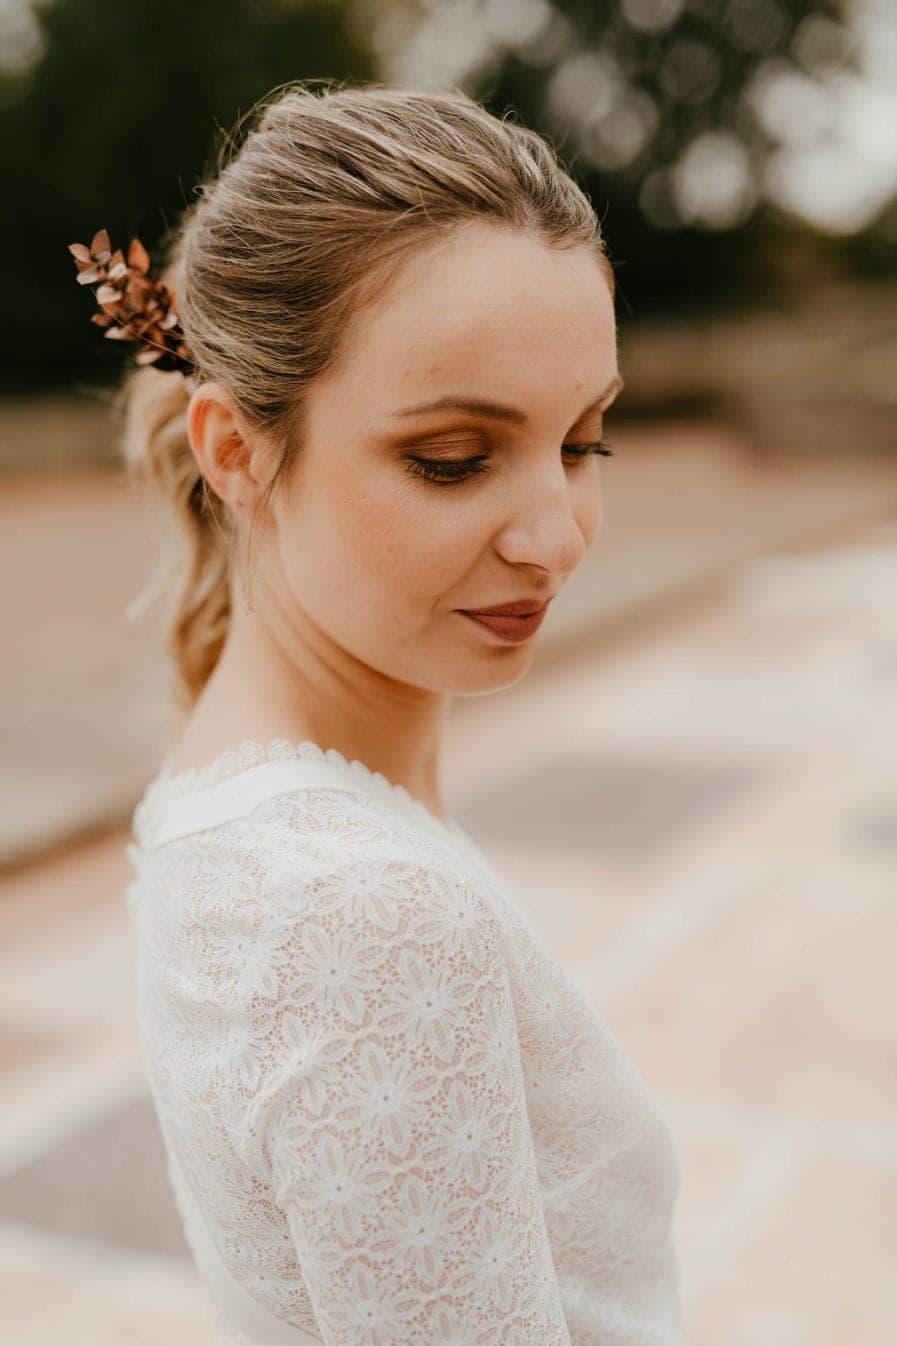 Peigne de mariage Phyra version Antique - Anaïs Nannini - Les Fleurs Dupont - Gamme Phyra